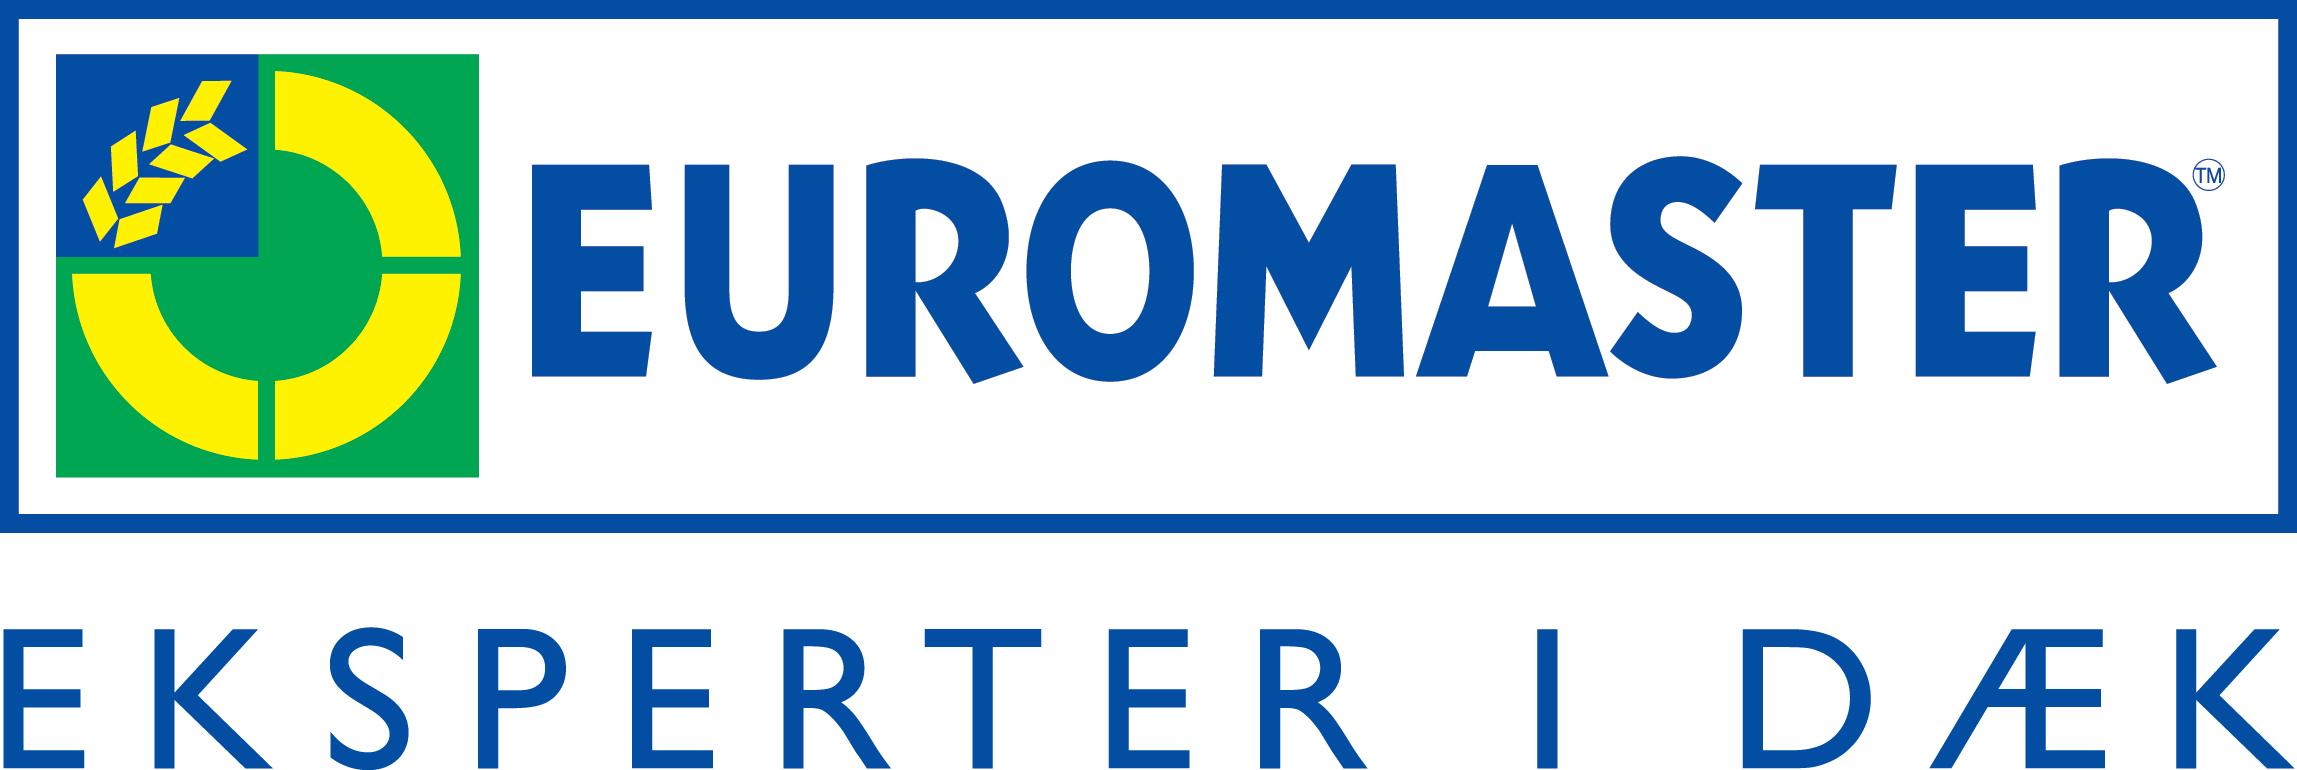 Euromaster Holbæk logo